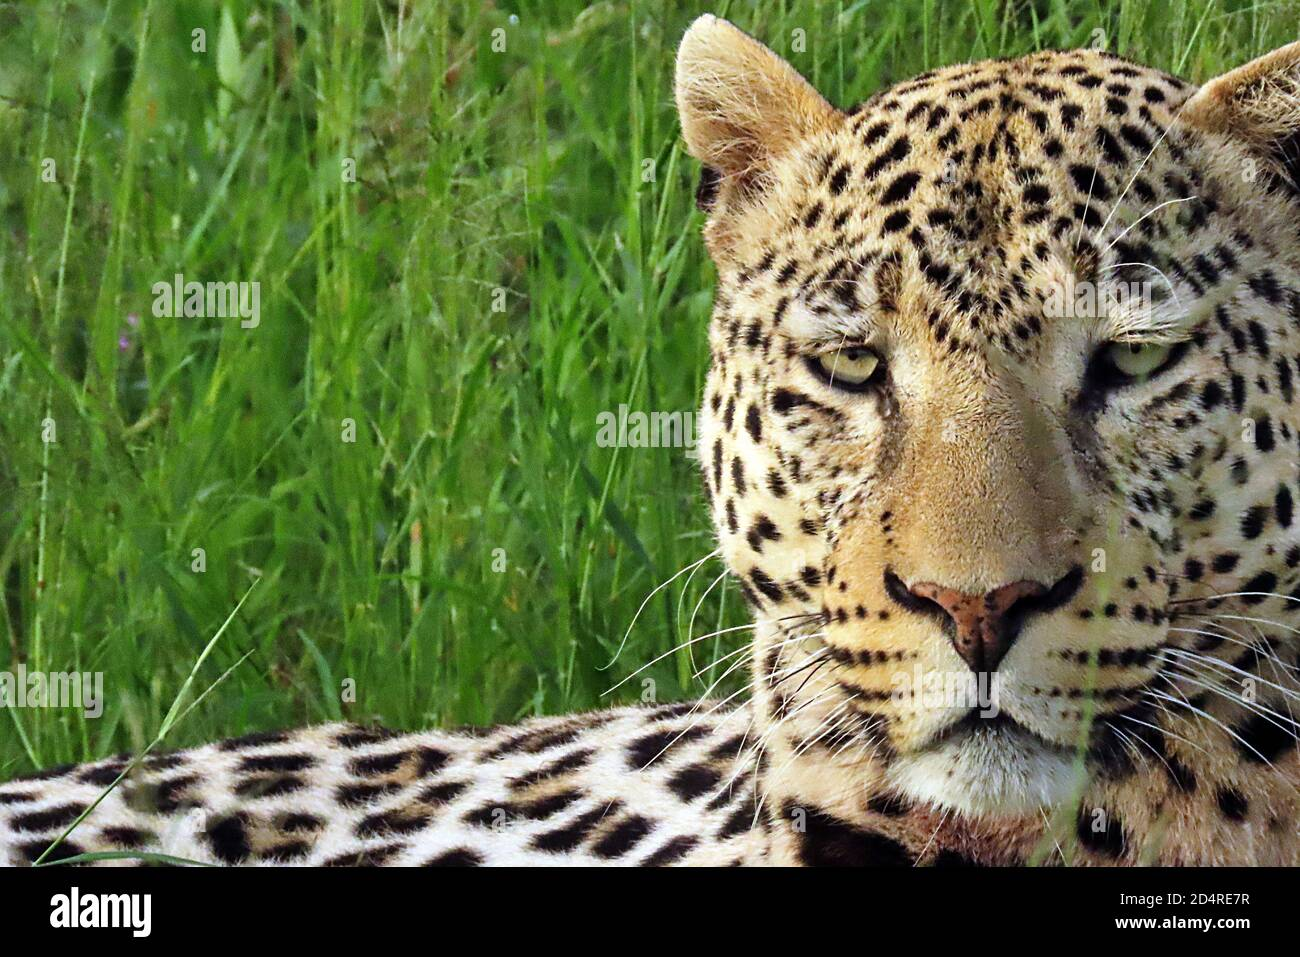 An African Leopard (Panthera pardus) hiding in grass at Okonjima, Otjozondjupa Region, Namibia. Stock Photo